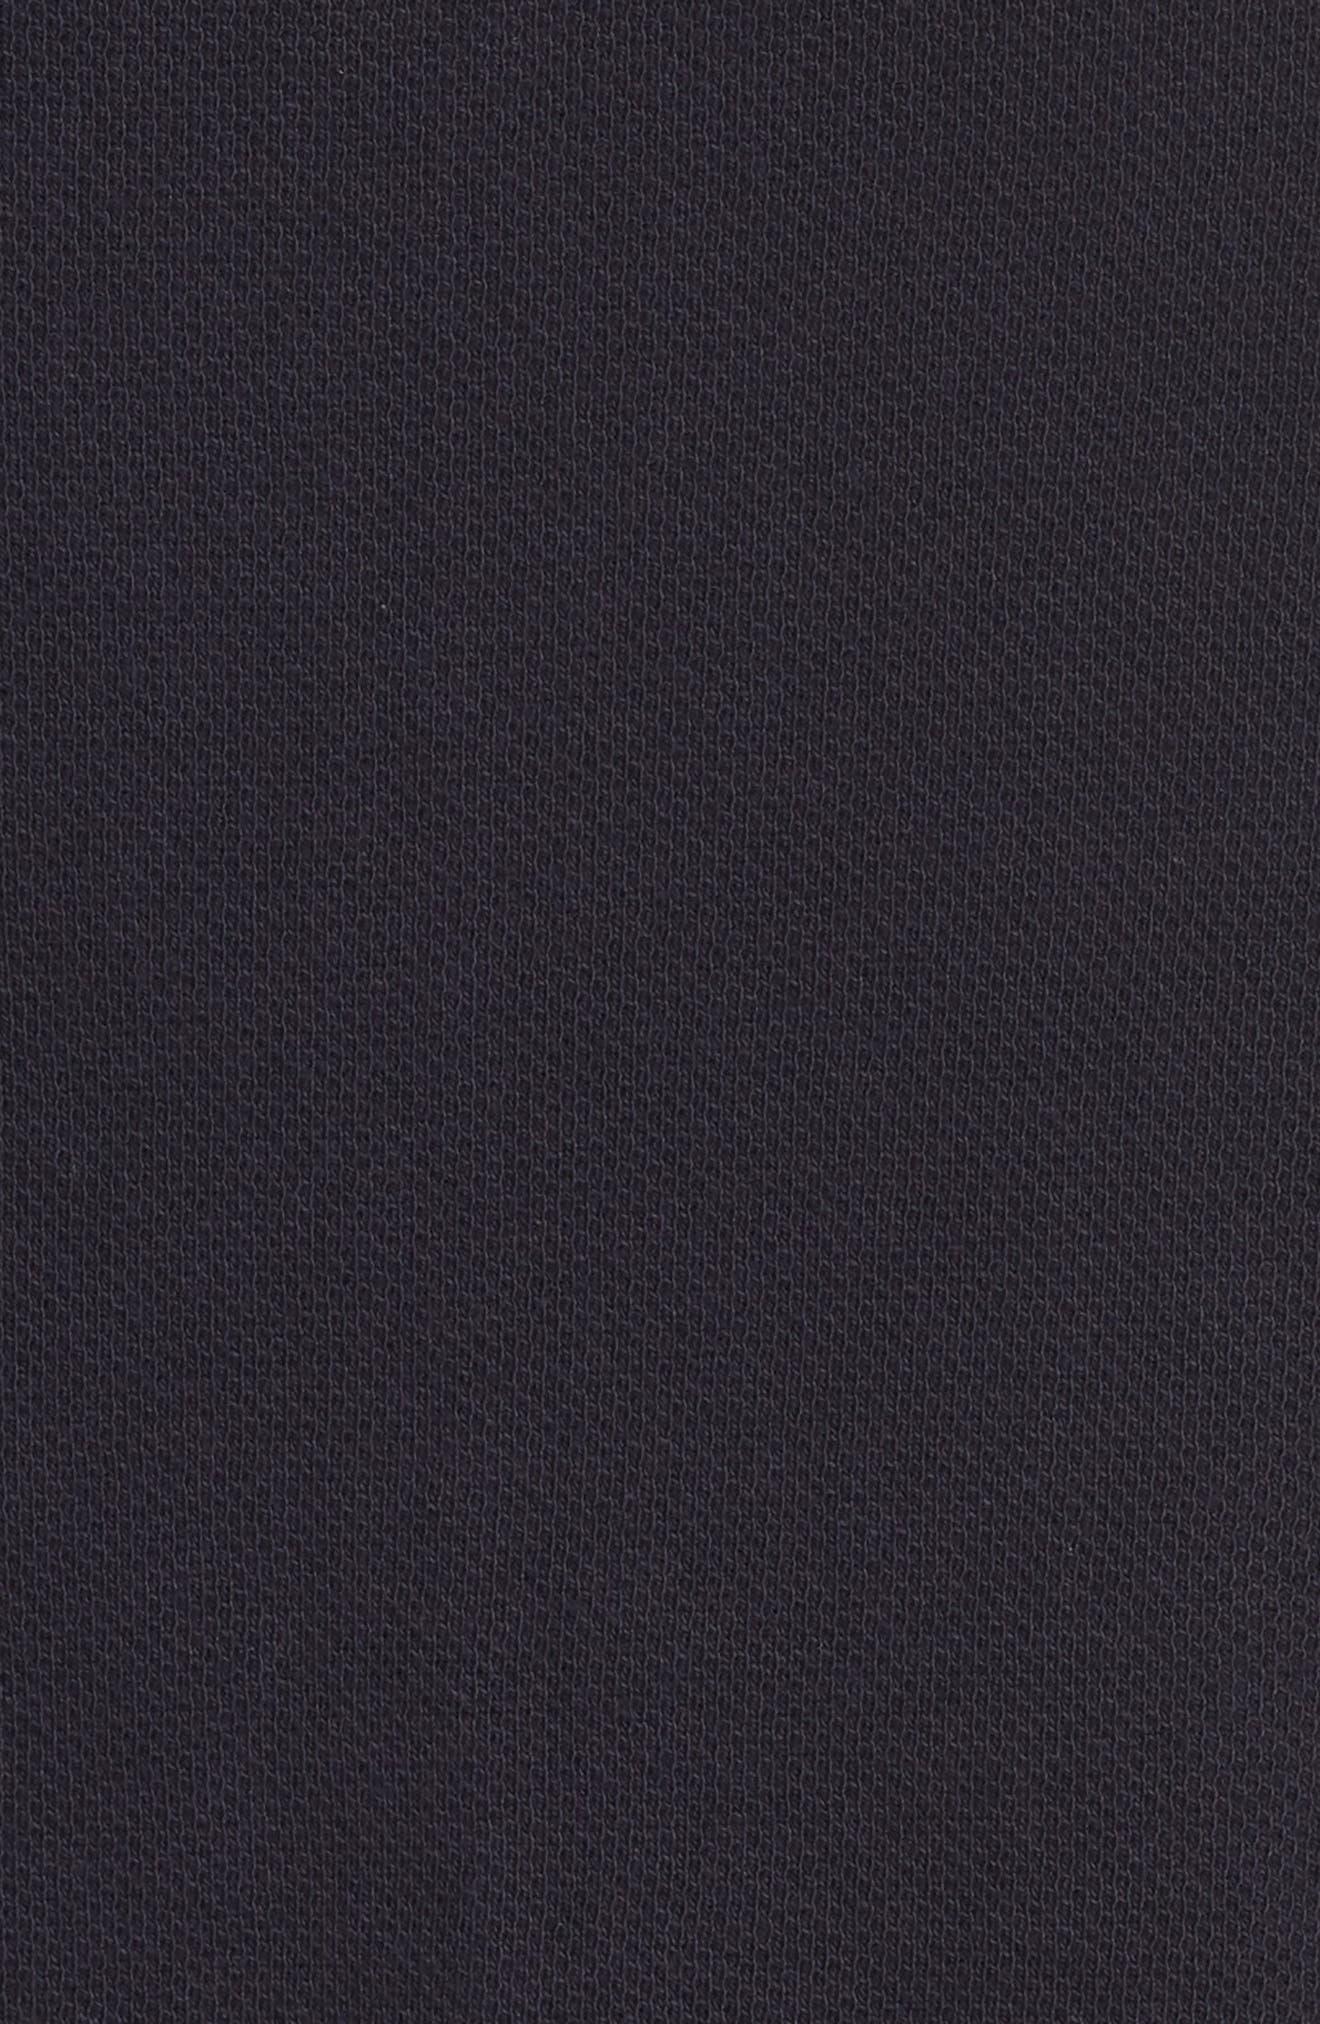 Jirgi Front Zip Sweater,                             Alternate thumbnail 5, color,                             Dark Naval Blue